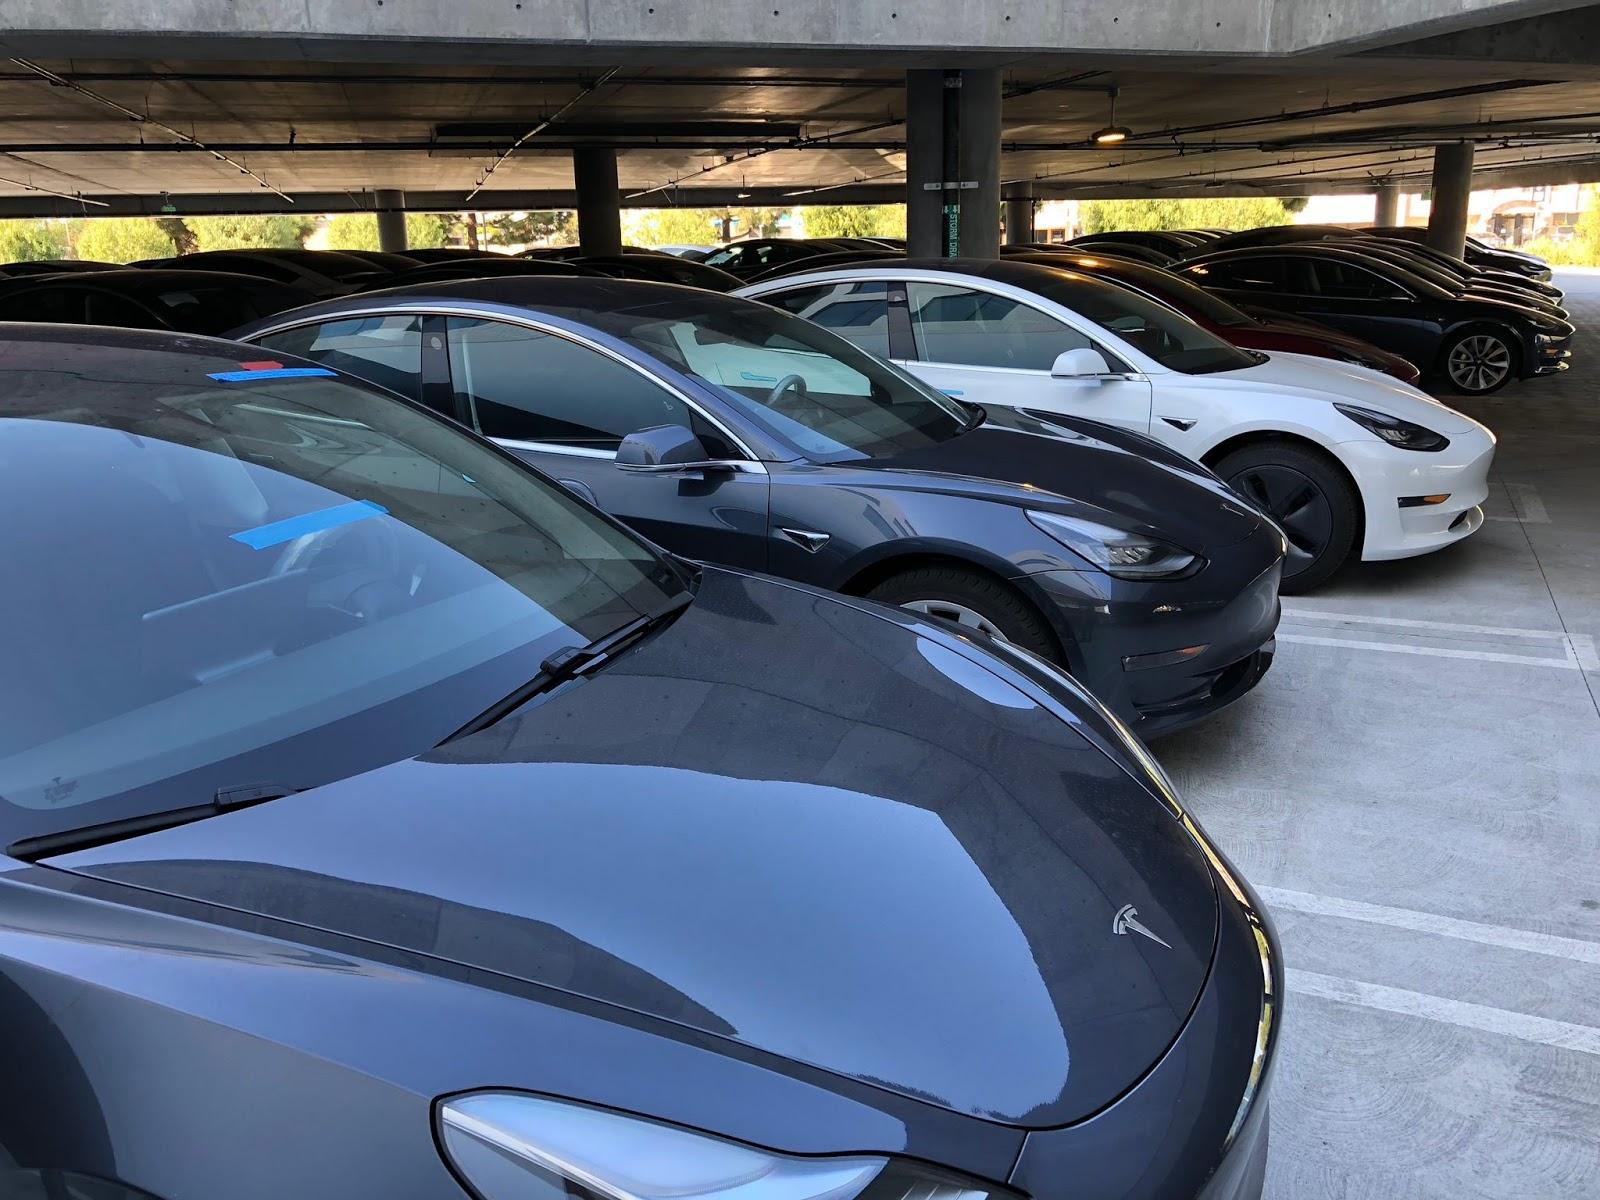 Tesla-LA-Parking-Lot-1